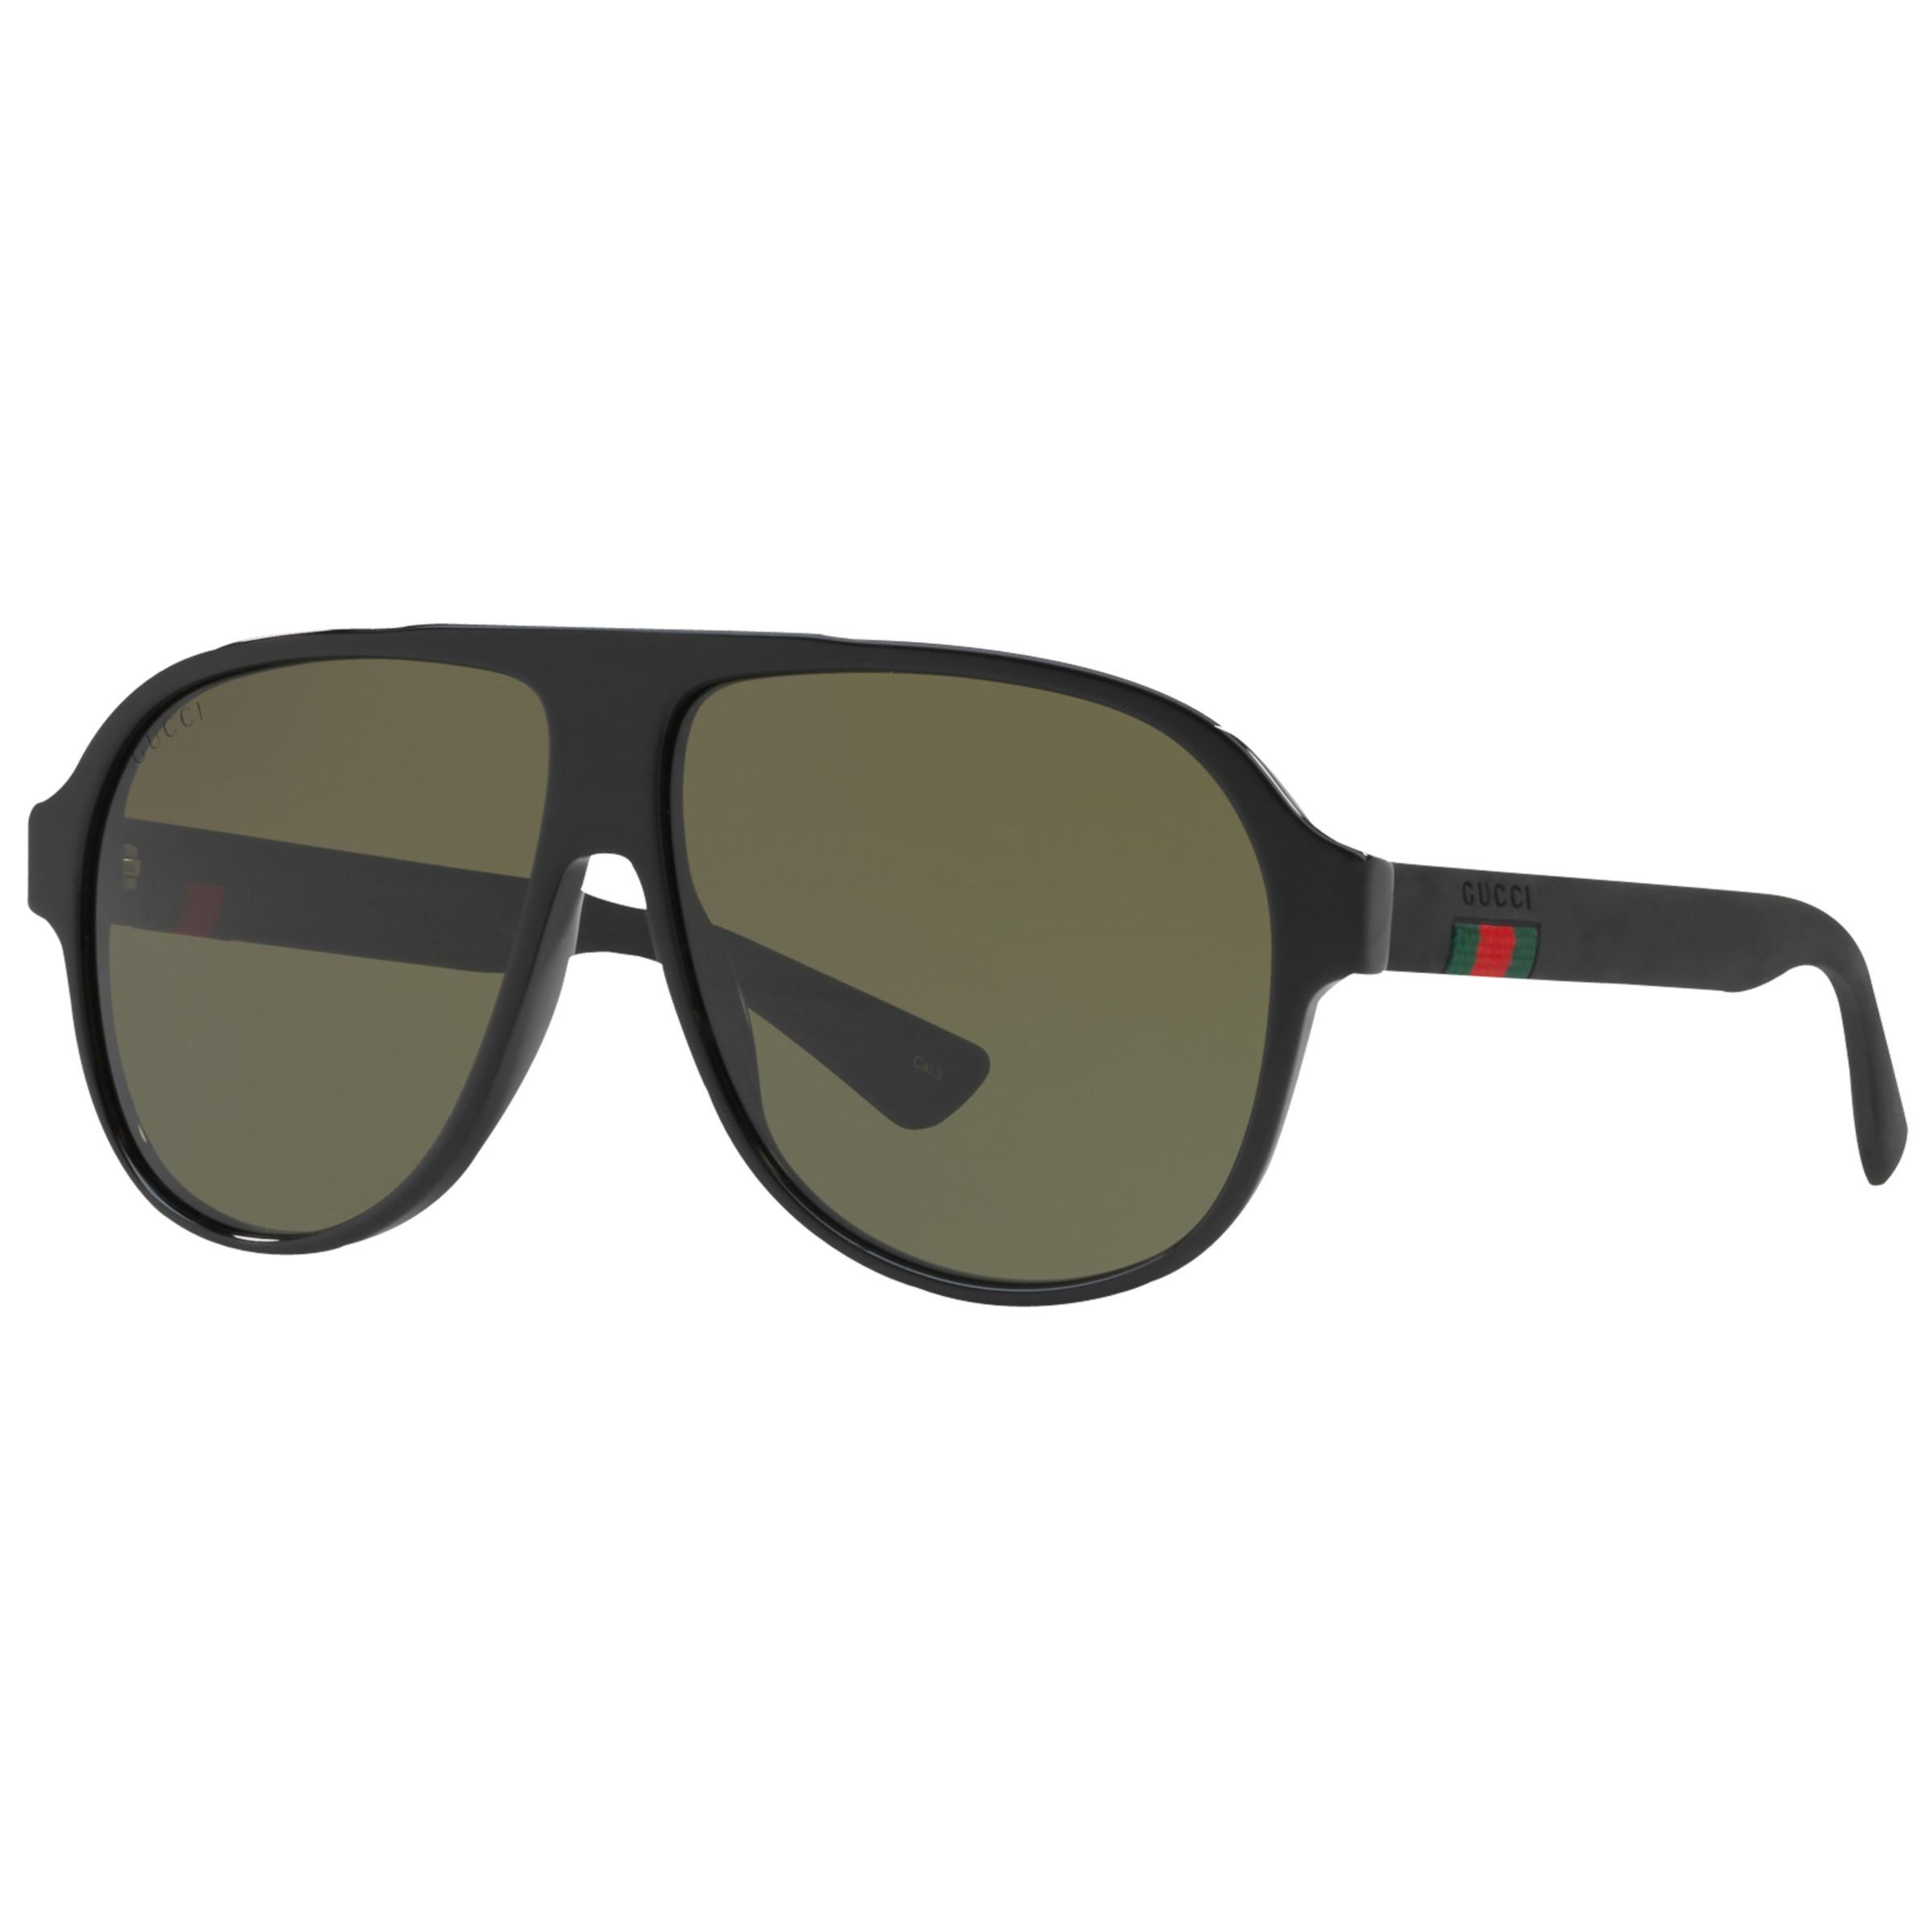 21d585b4 Gucci GG0009S Aviator Sunglasses, Matte Black/Green